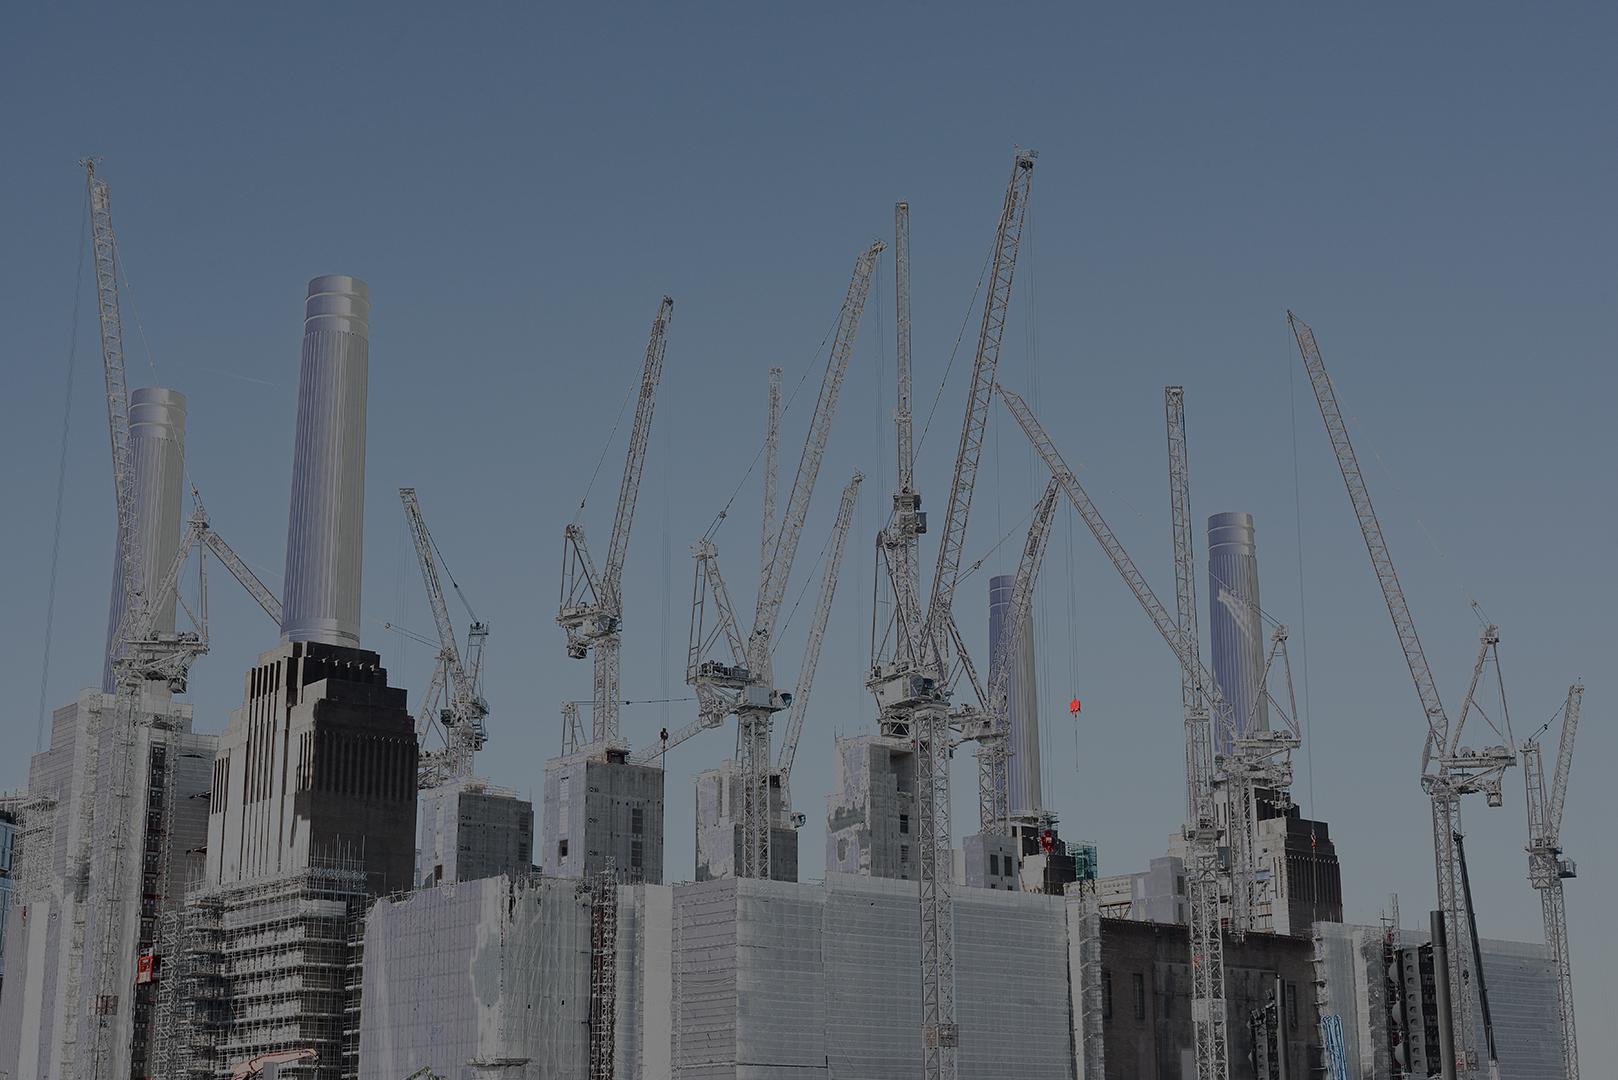 Cranes_4.jpg